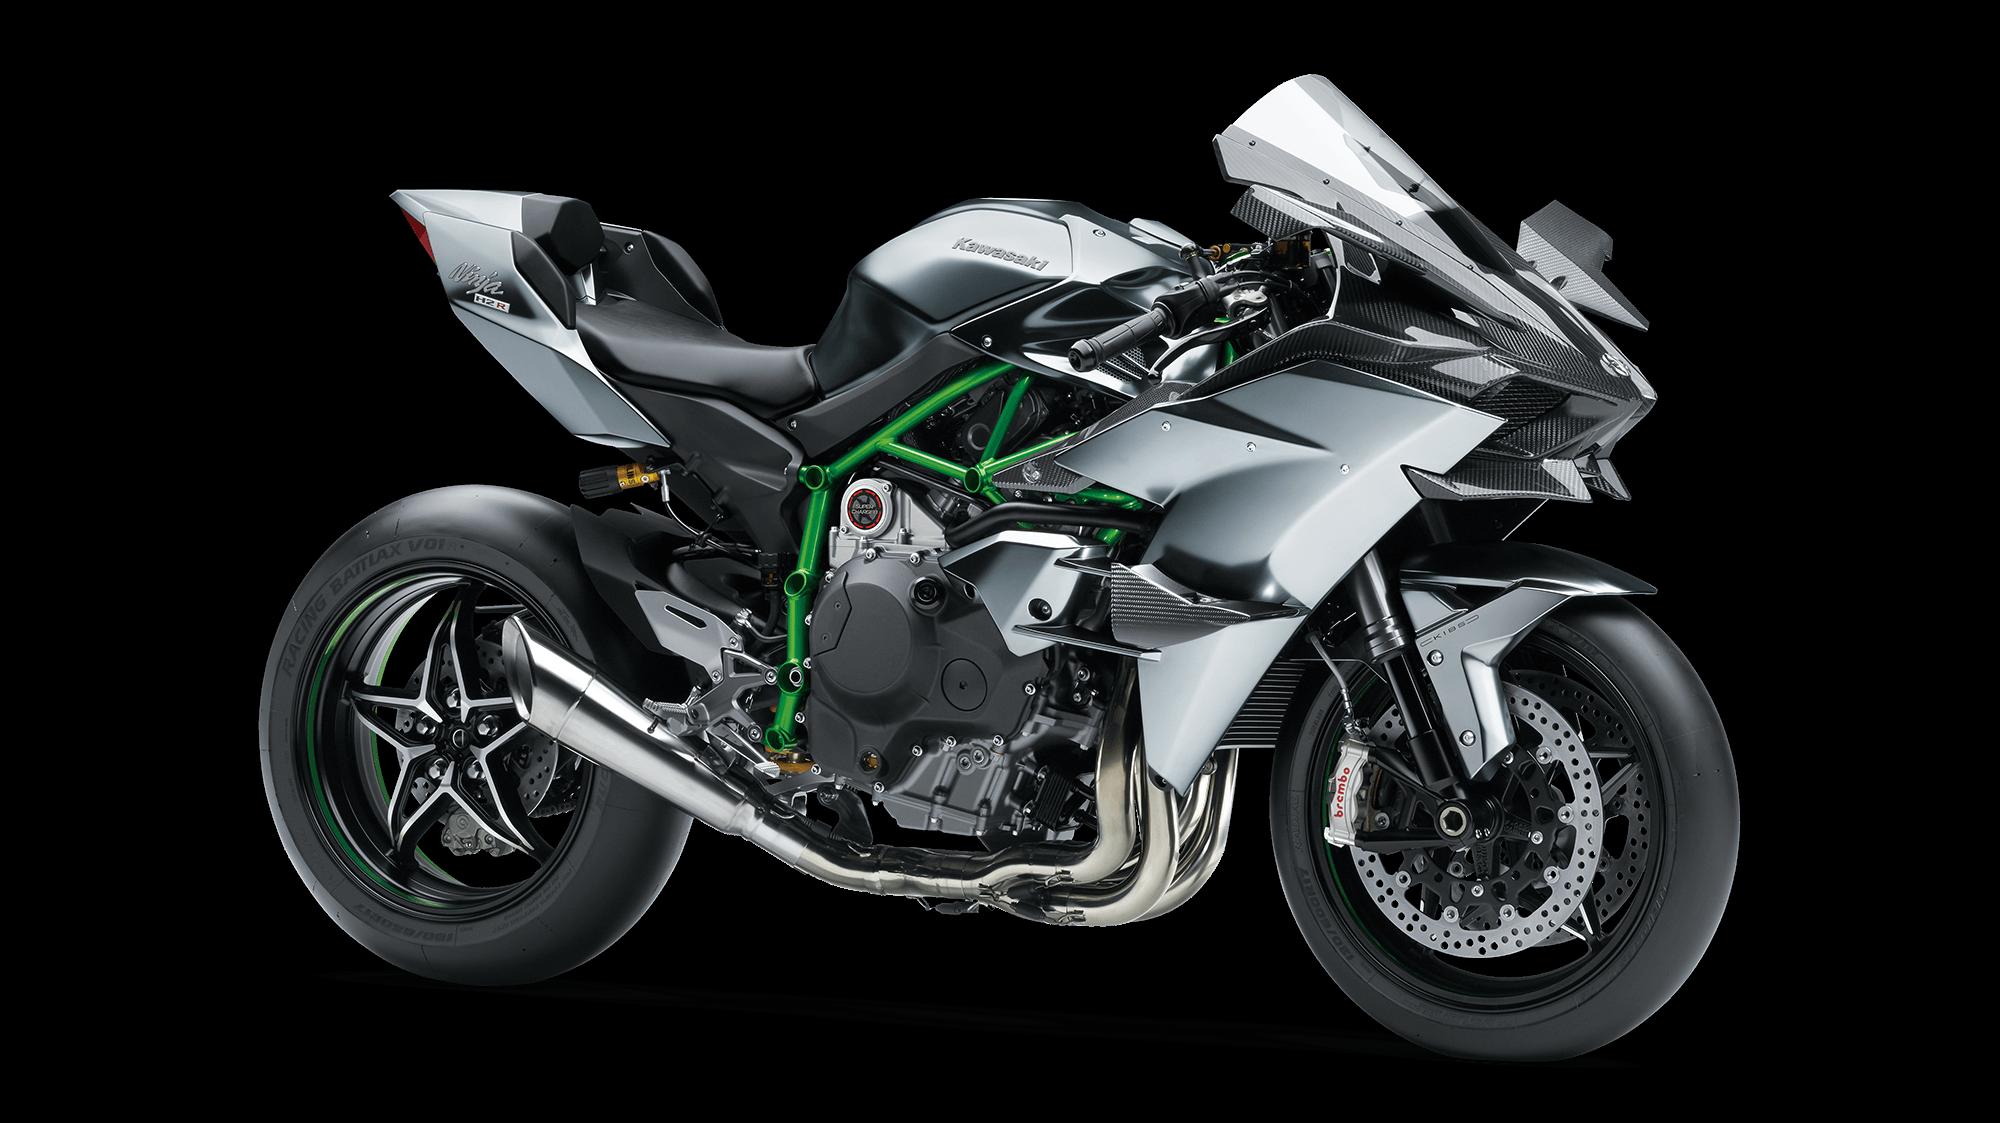 2020 Ninja H2r Ninja Motorcycle By Kawasaki